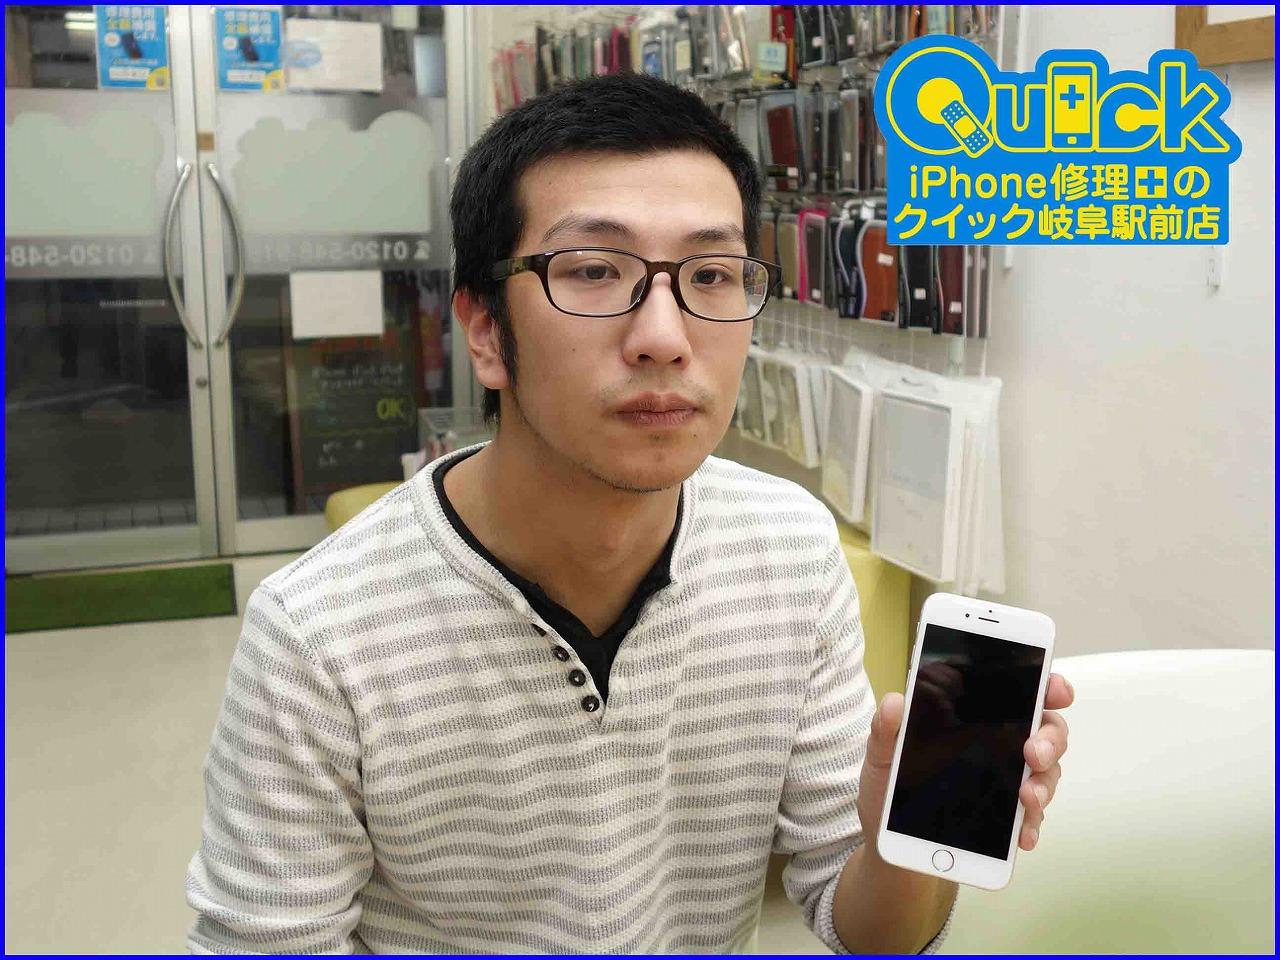 ☆iPhone6のガラス割れ修理に関市よりご来店!アイフォン修理のクイック岐阜